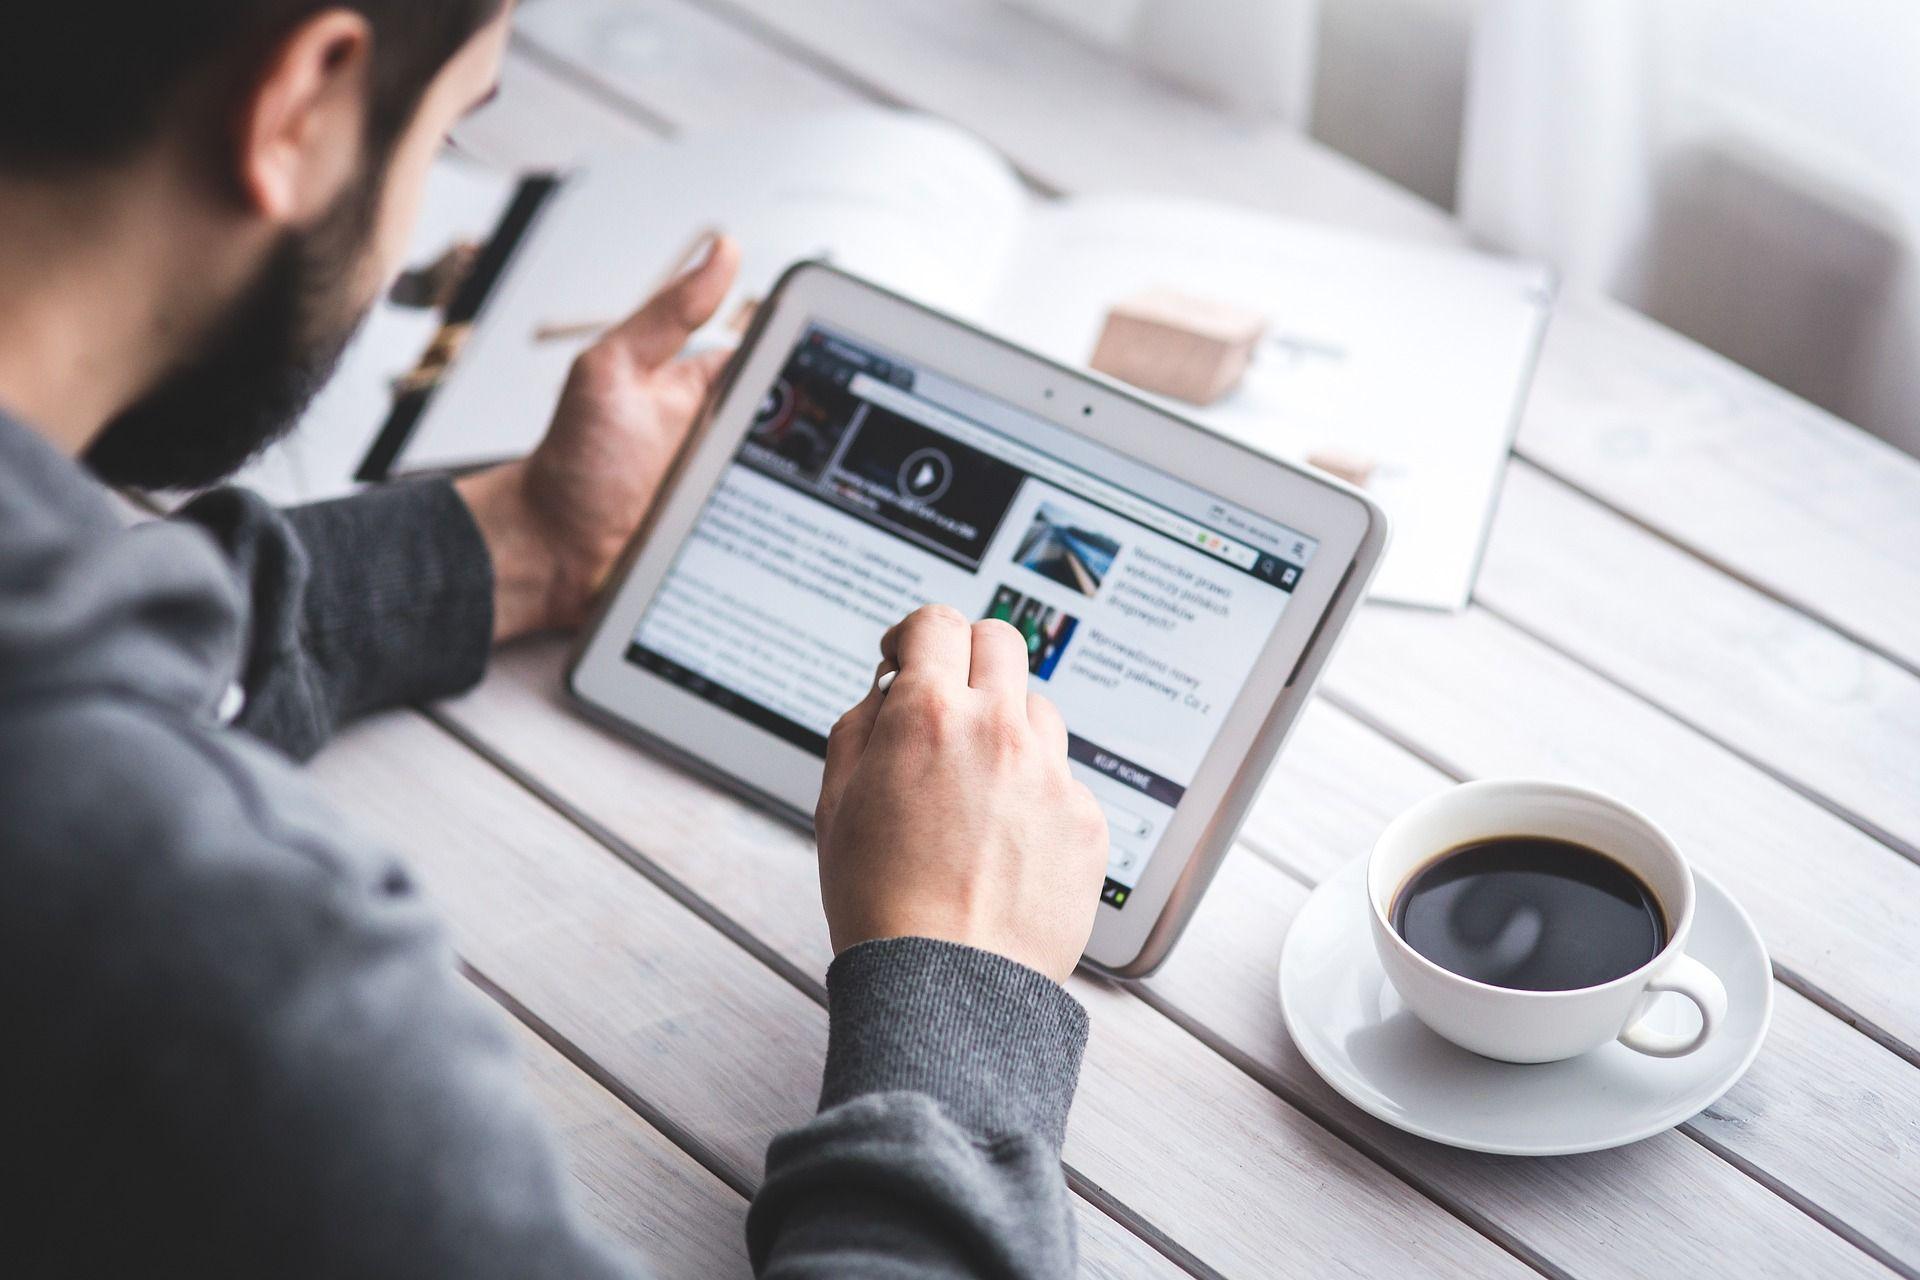 Are Newspaper Publishers Ready for #Digital-Only? https://t.co/JzApFtXcm2 #media #digitaltransformation via @MediaShiftOrg #digitalstrategy https://t.co/w0CLZ4ObZK